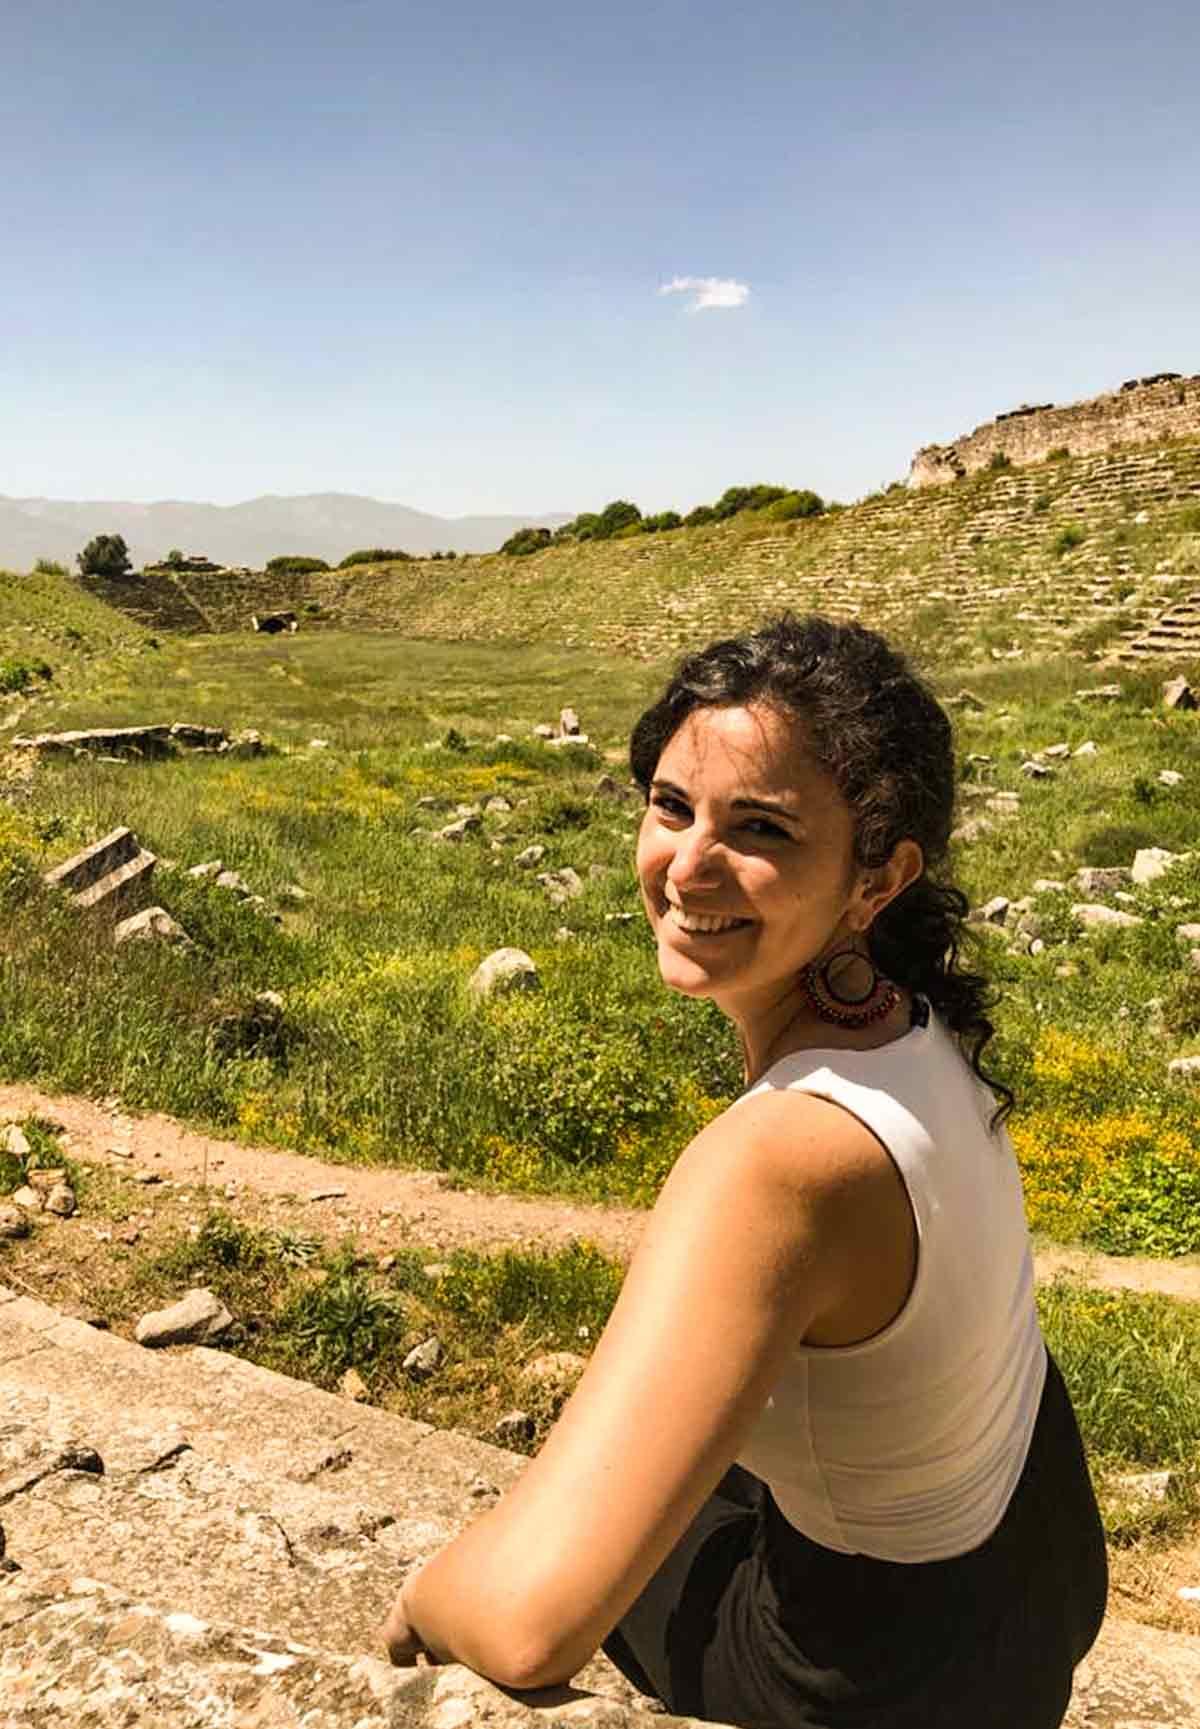 escursione ad aphrodiasias in cappadocia